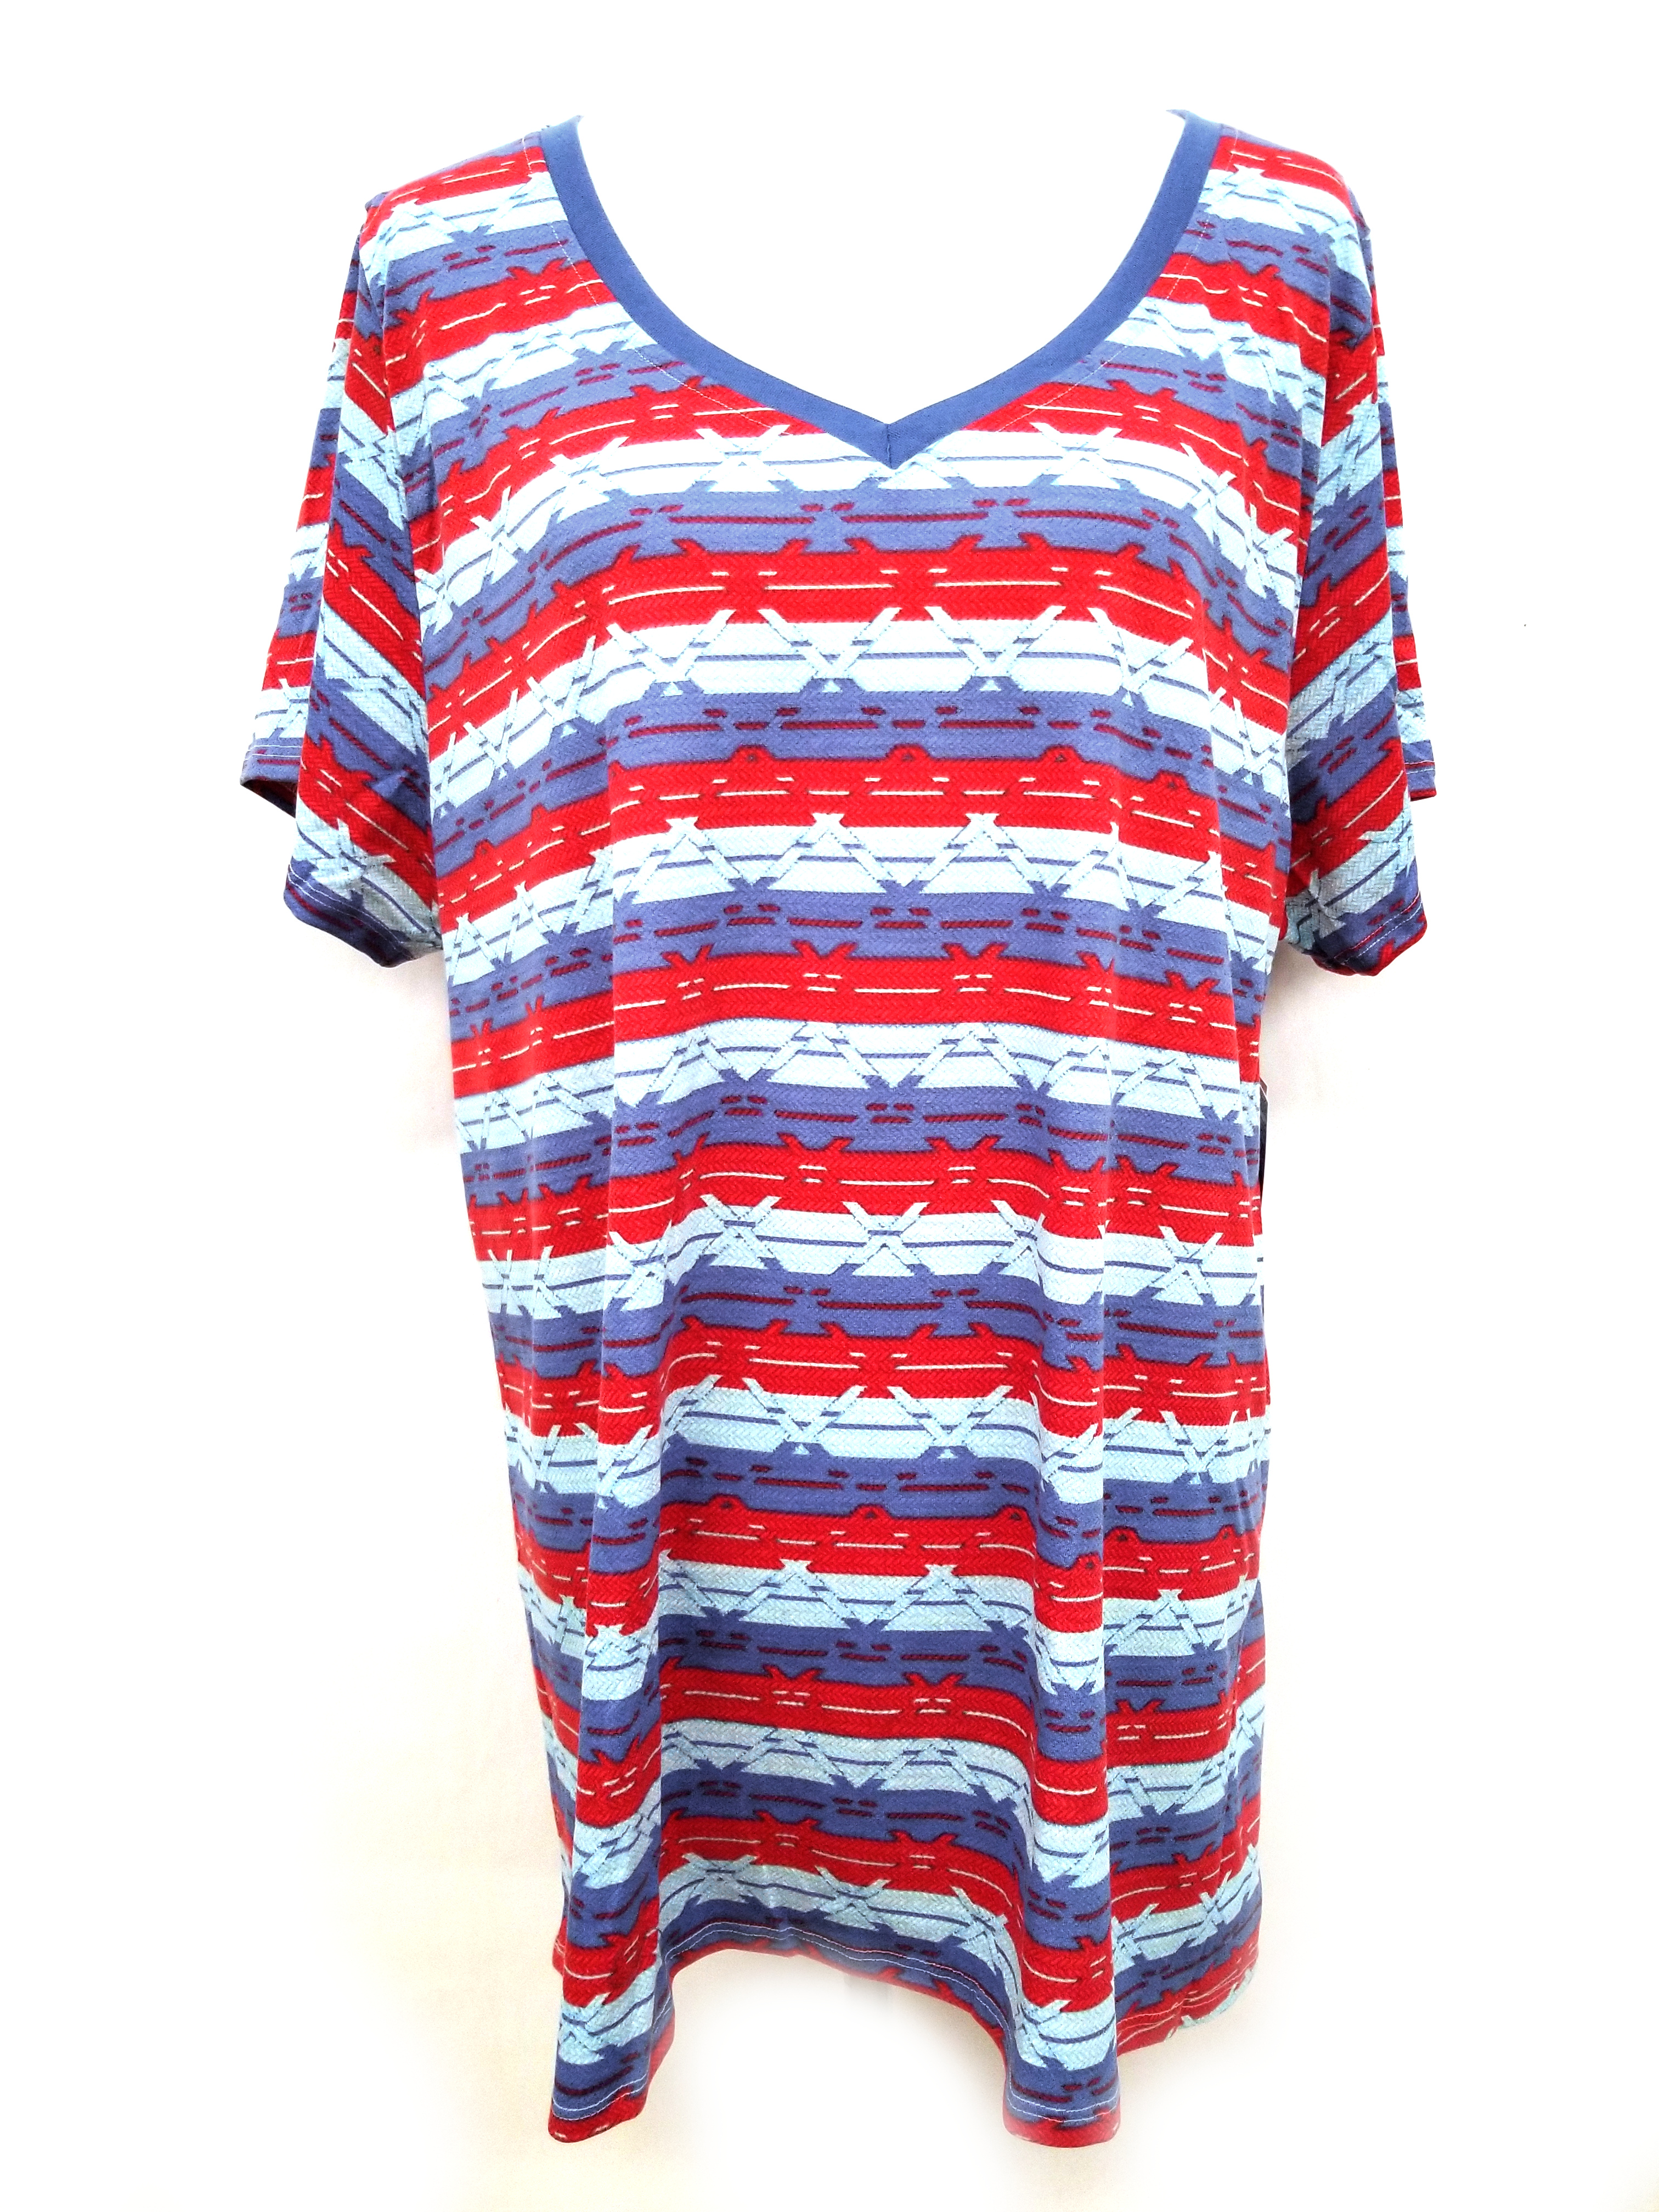 New LuLaRoe Christy T Shirt Americana 3XL white blue red leopard print